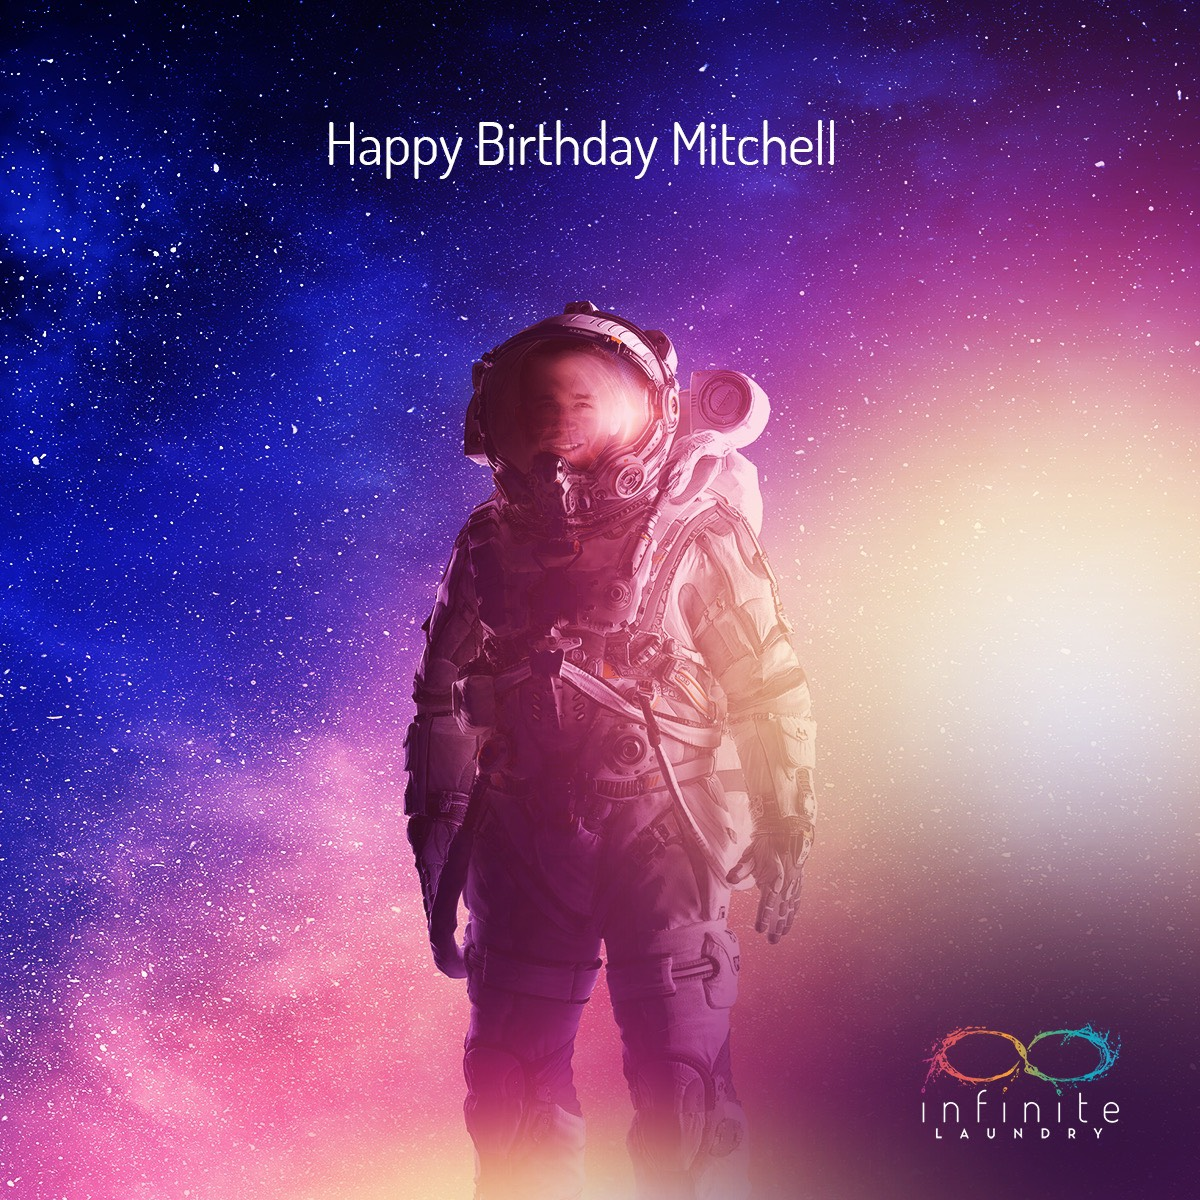 Sending happy birthday wishes to our President Mitchell Holt! 🎉 #WeAreInfinite #InfiniteLaundry